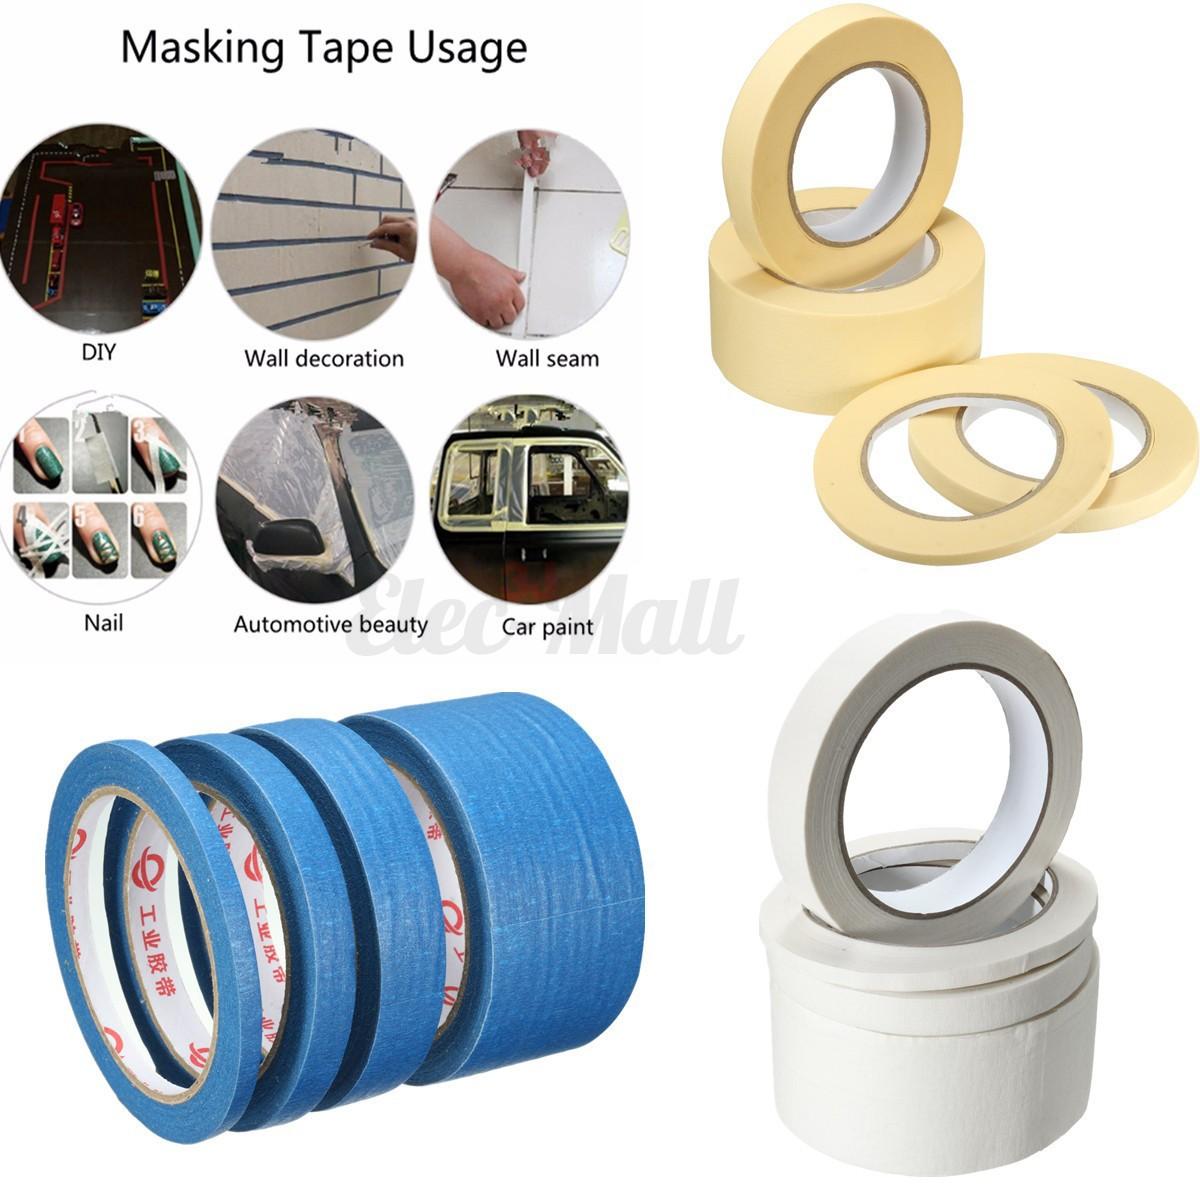 masking tape diy painting paper painter decor craft general purpose various size ebay. Black Bedroom Furniture Sets. Home Design Ideas